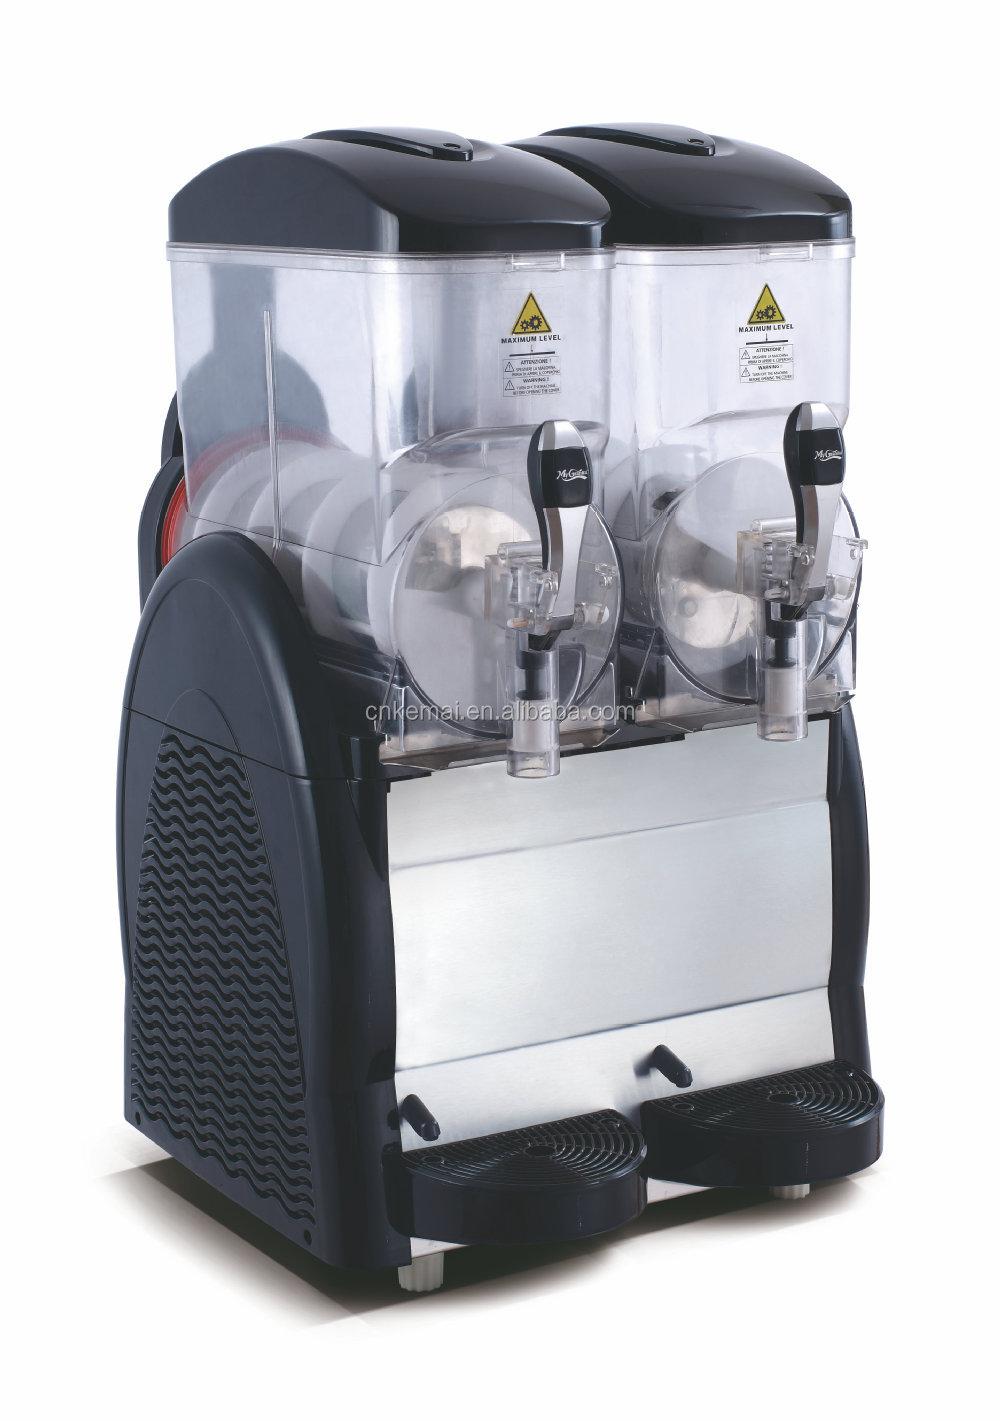 slush machine lease to buy